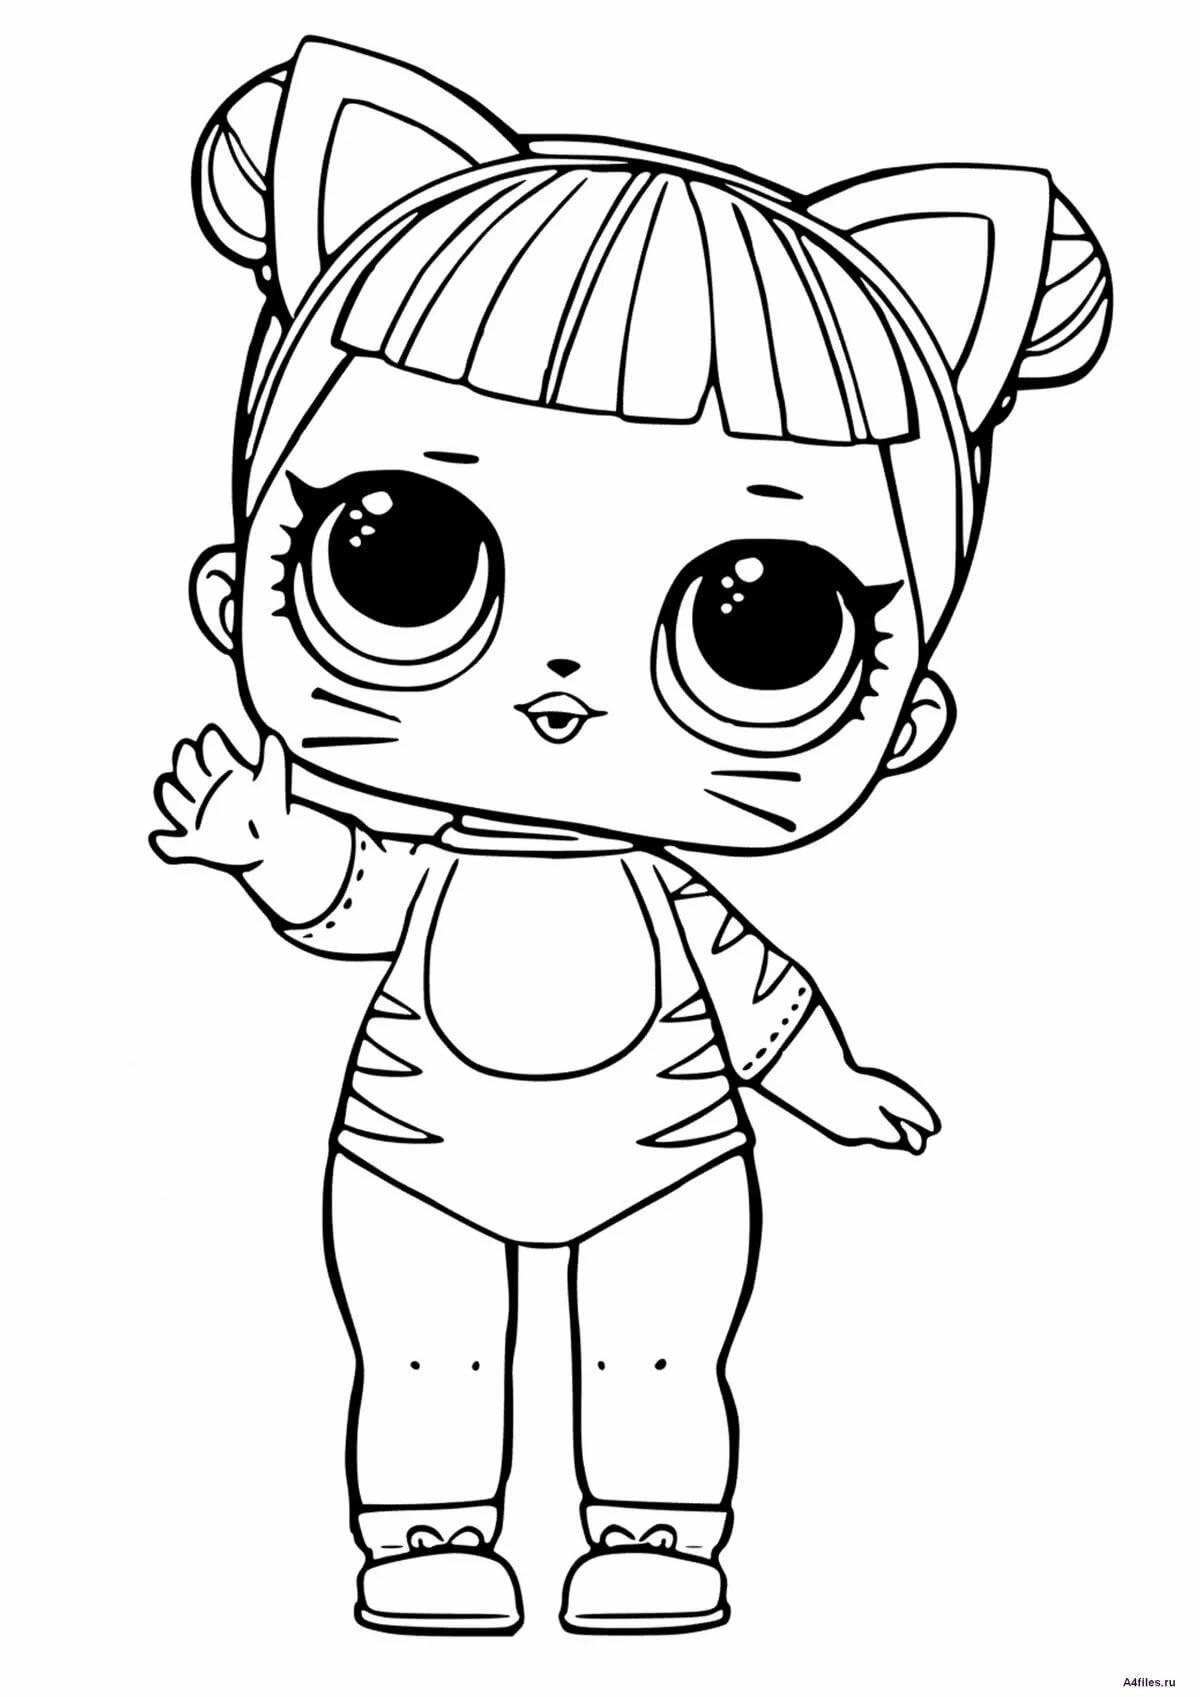 «Кукла ЛОЛ: раскраска для девочек - Раскраски А4 формата ...